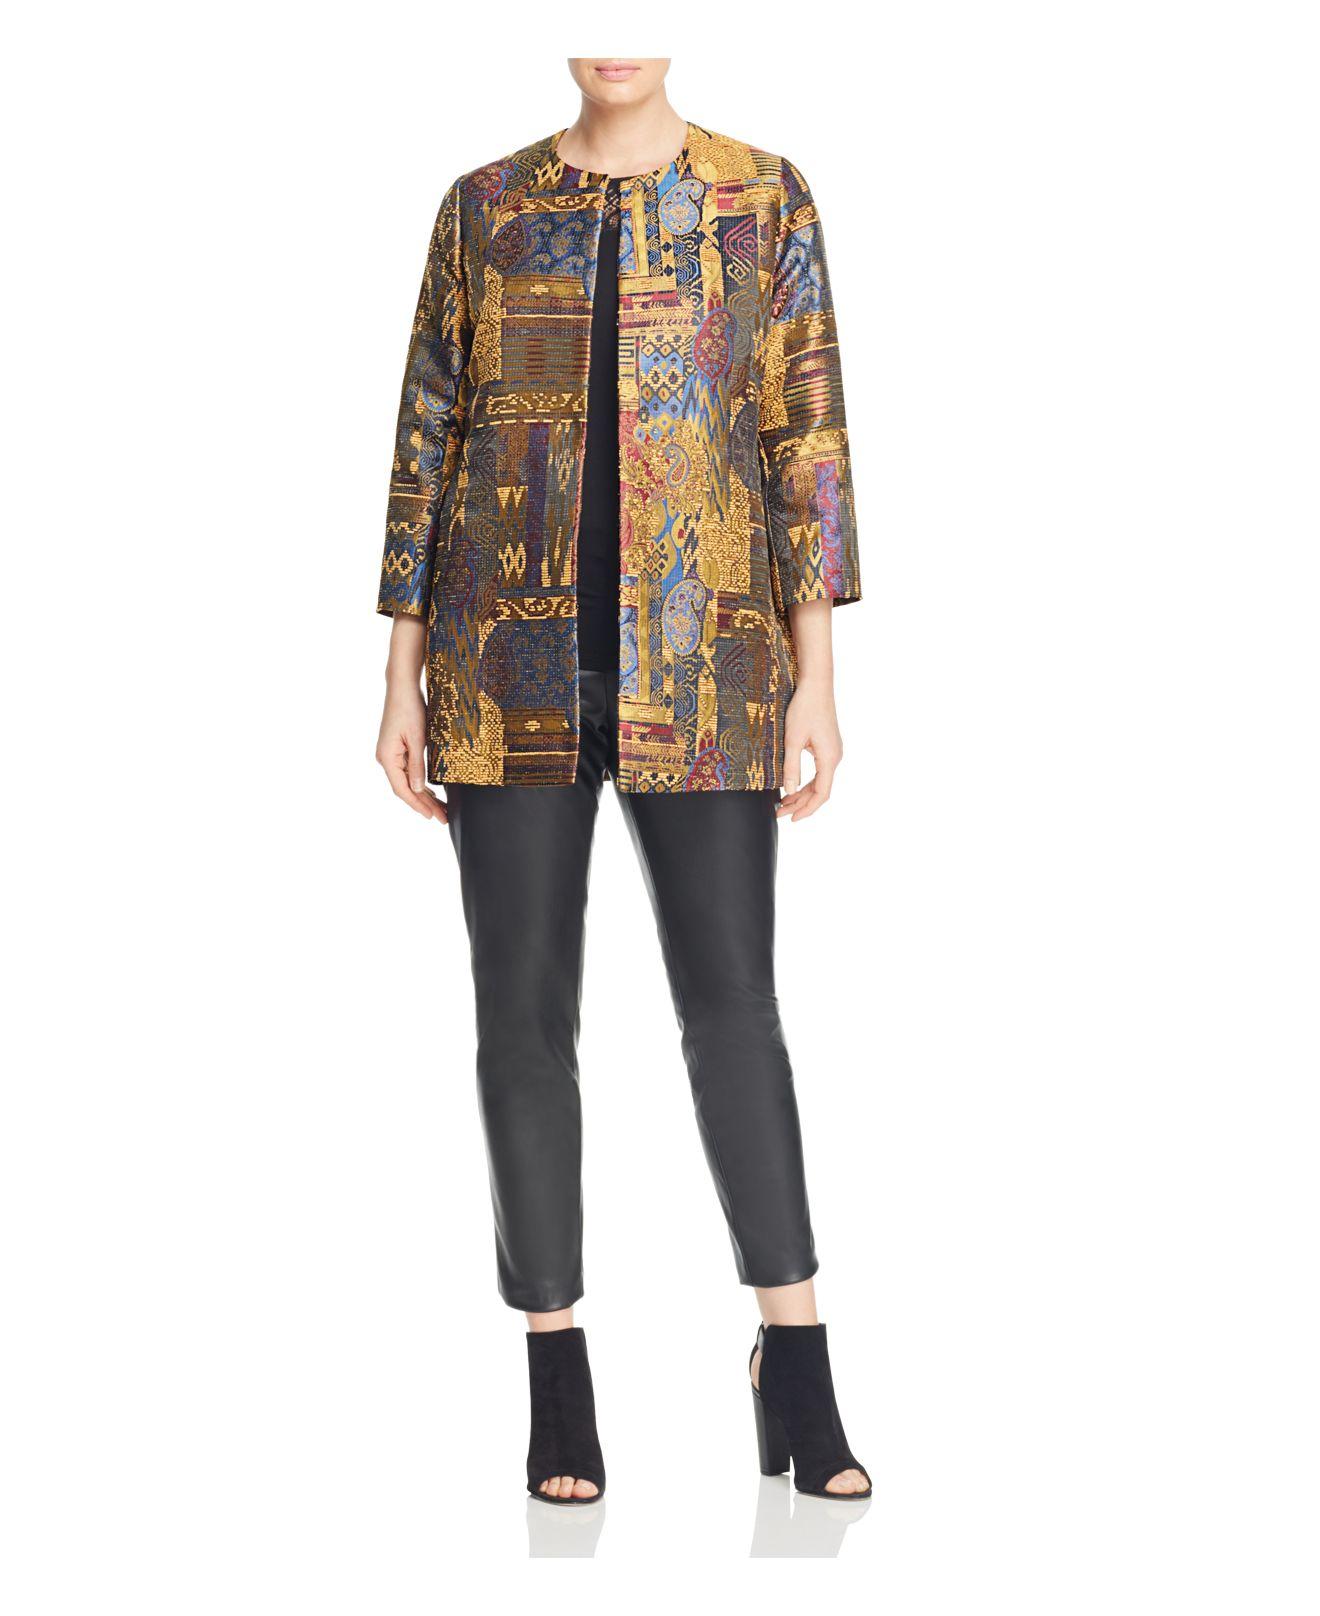 Lyst Marina Rinaldi Nave Tapestry Jacquard Jacket